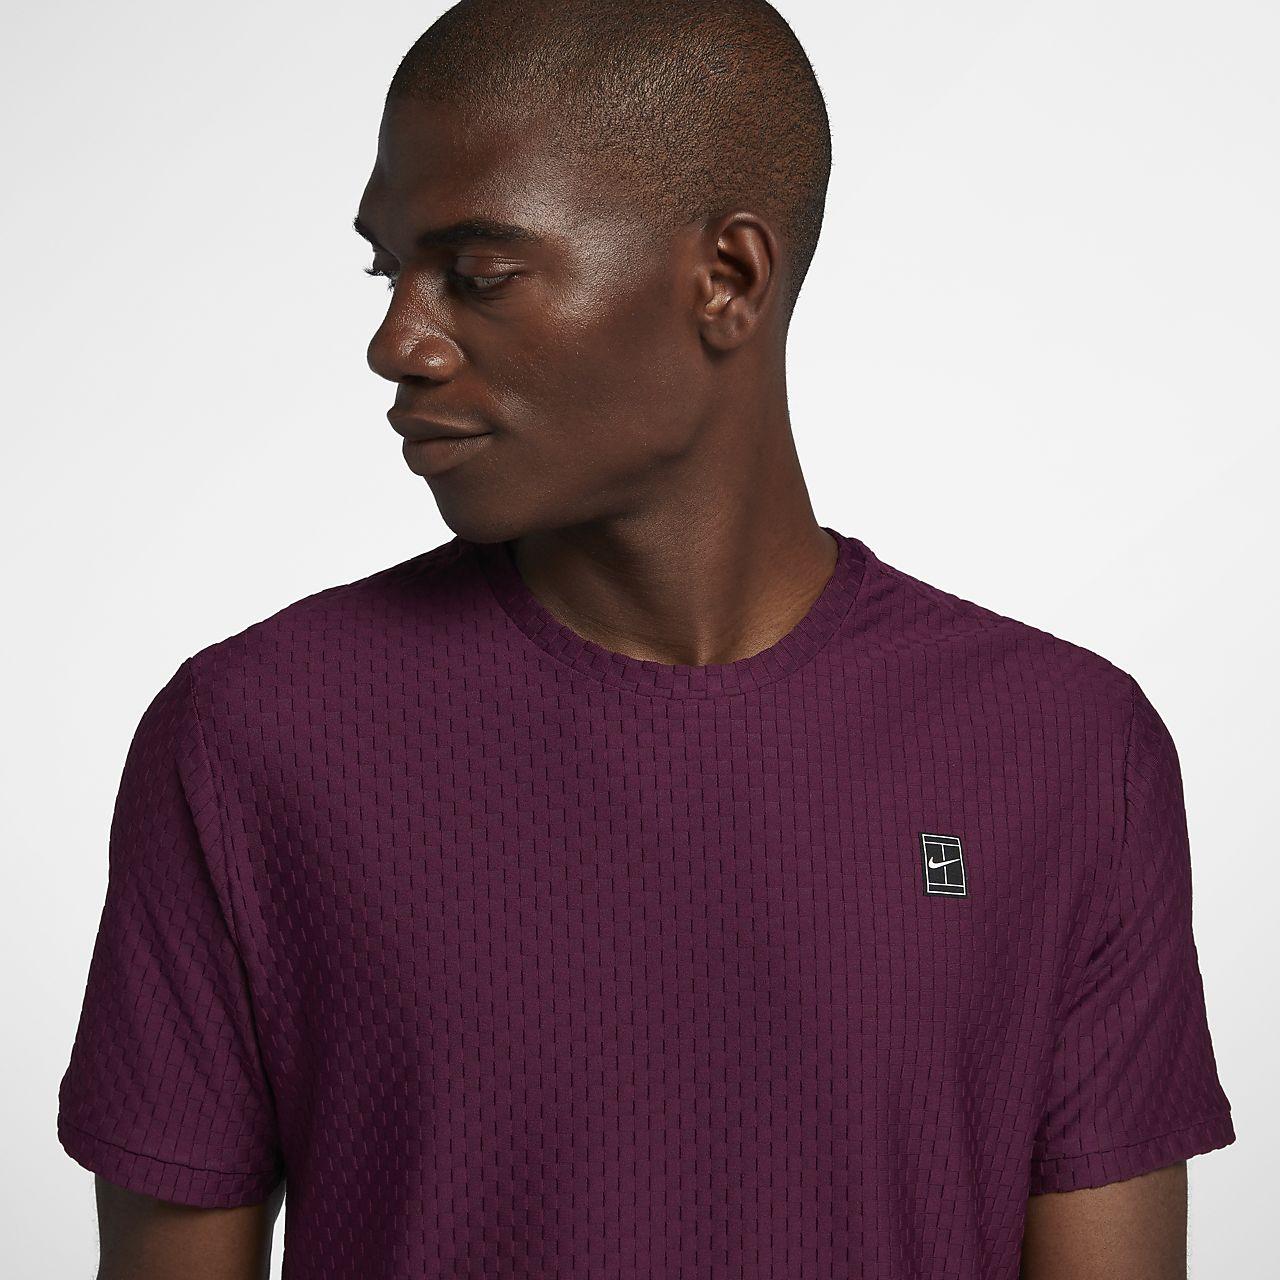 0ccbc8a6 NikeCourt Men's Short Sleeve Tennis Top. Nike.com